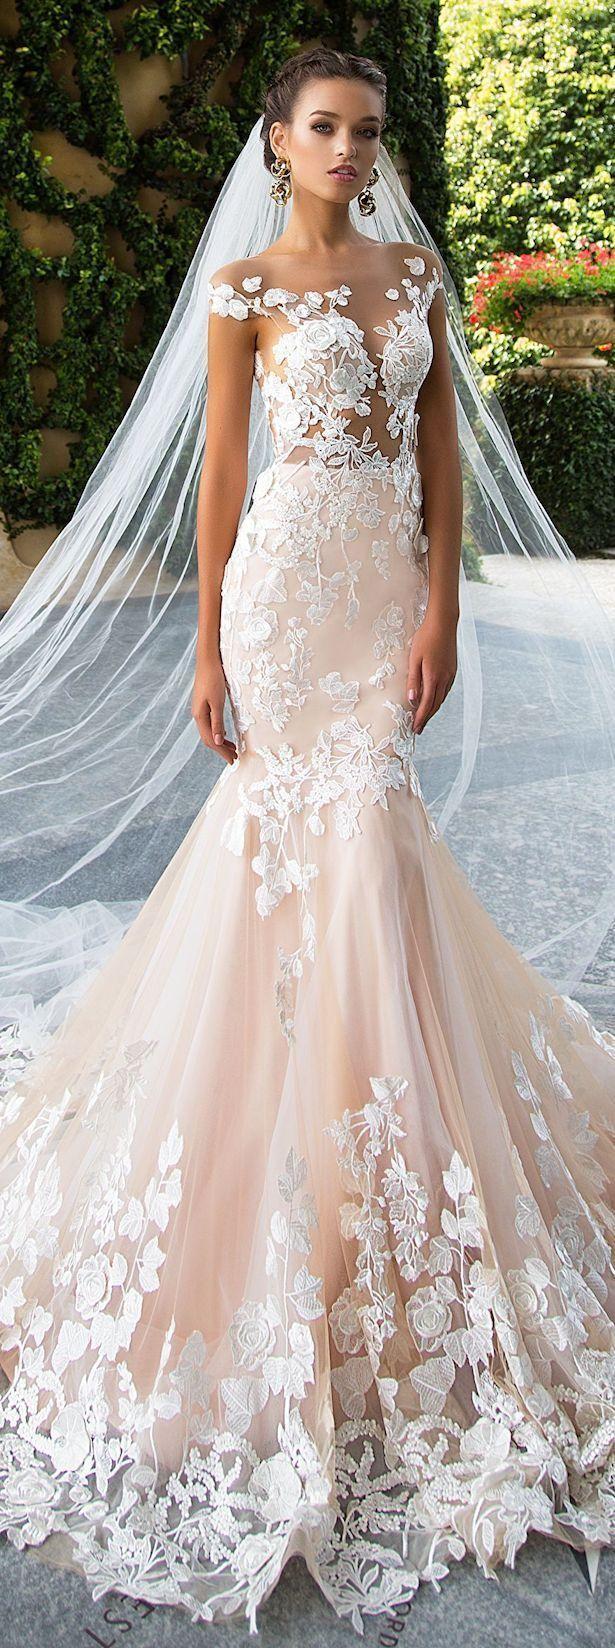 10833 best Wedding Dresses images on Pinterest | Short wedding ...